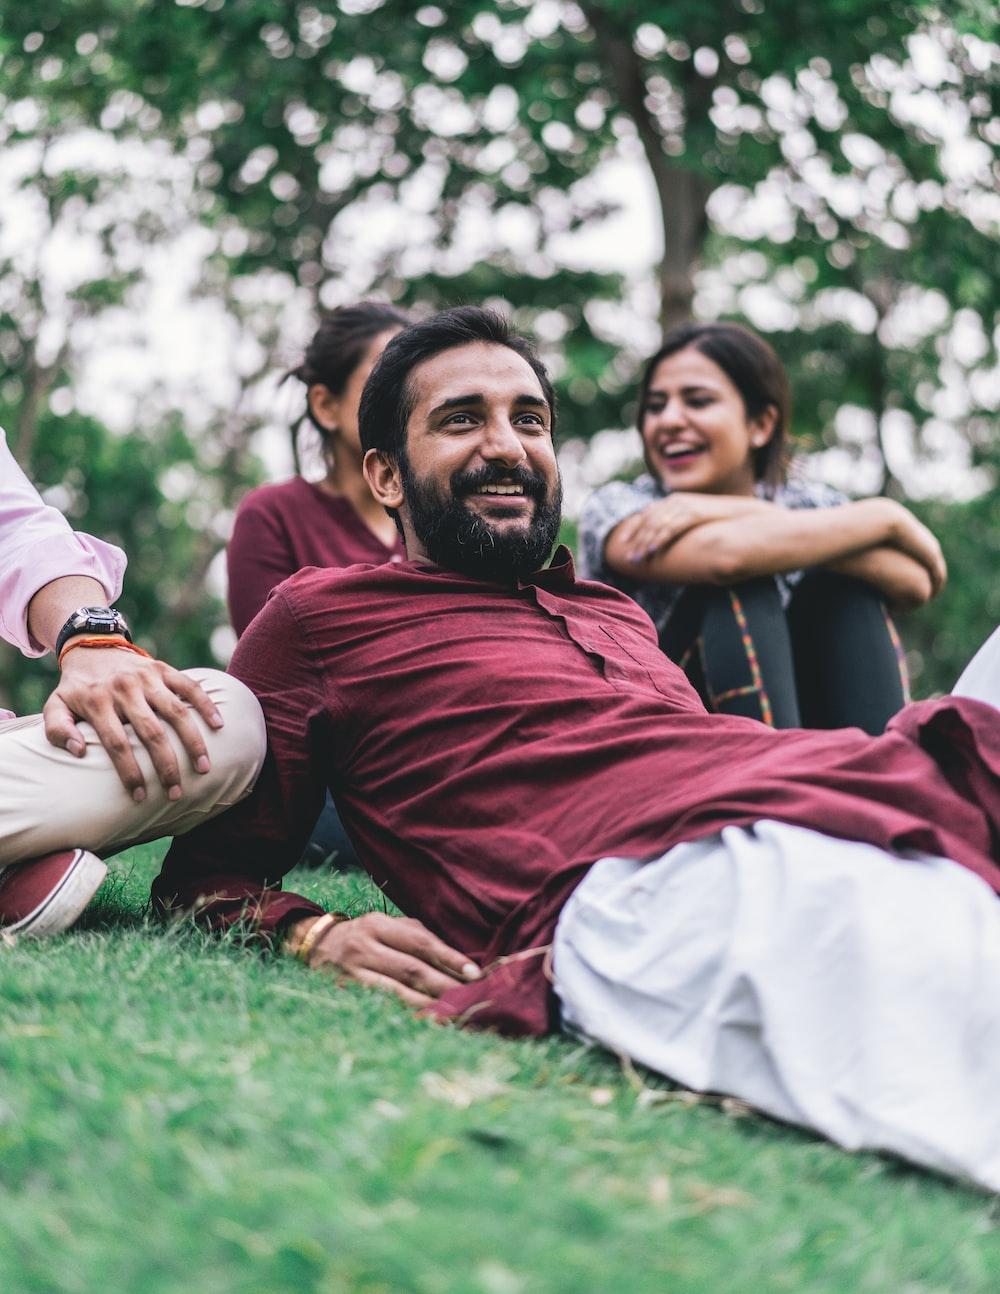 man in maroon dress shirt lying on green grass field